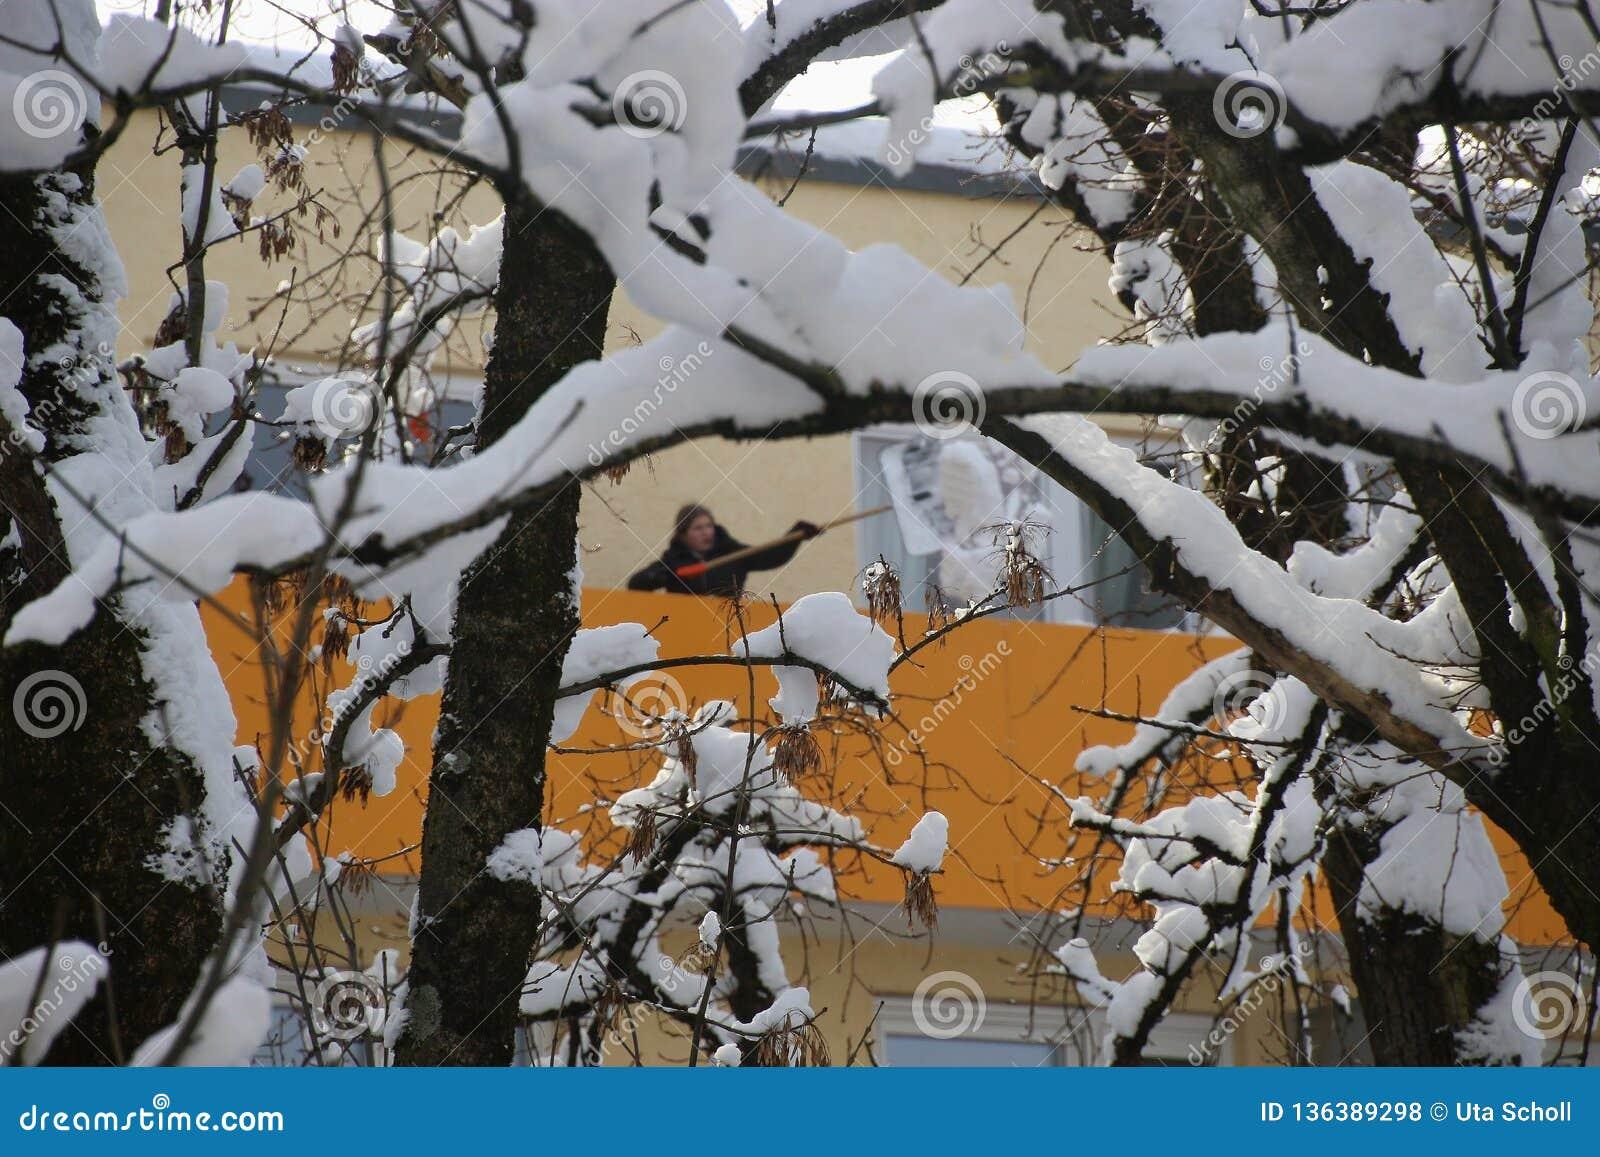 Winter in the suburb. Salzburg city, Austria.